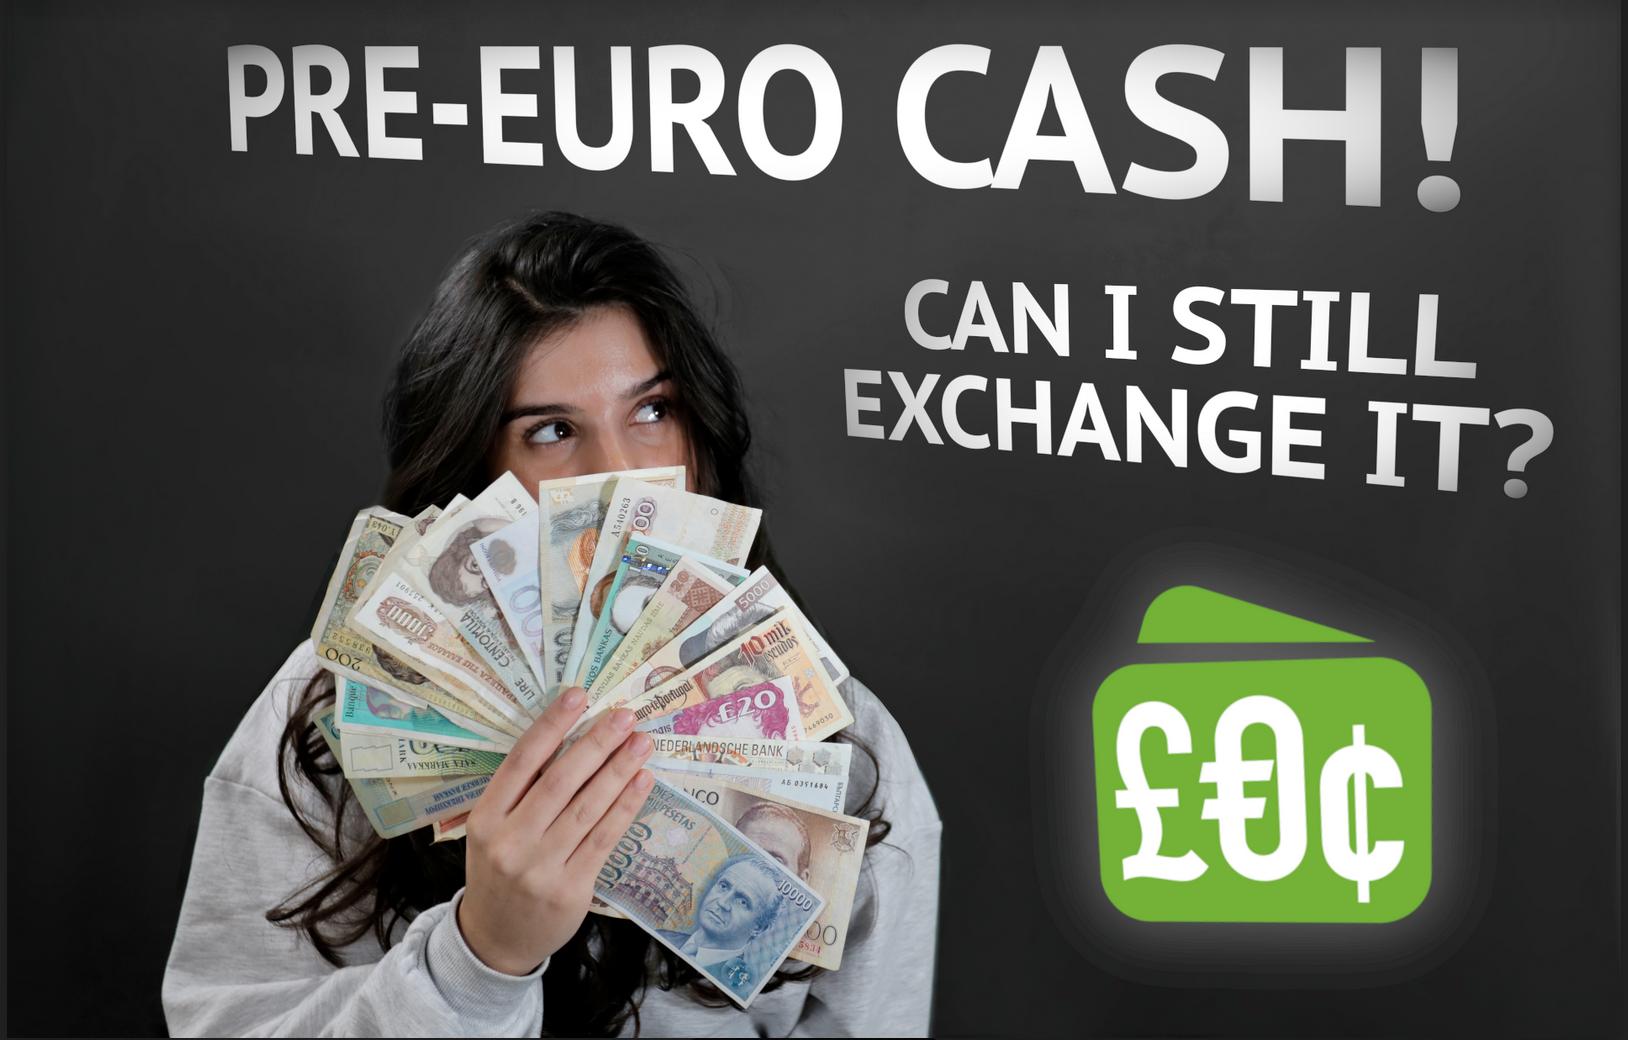 pre-euro cash thumbnail